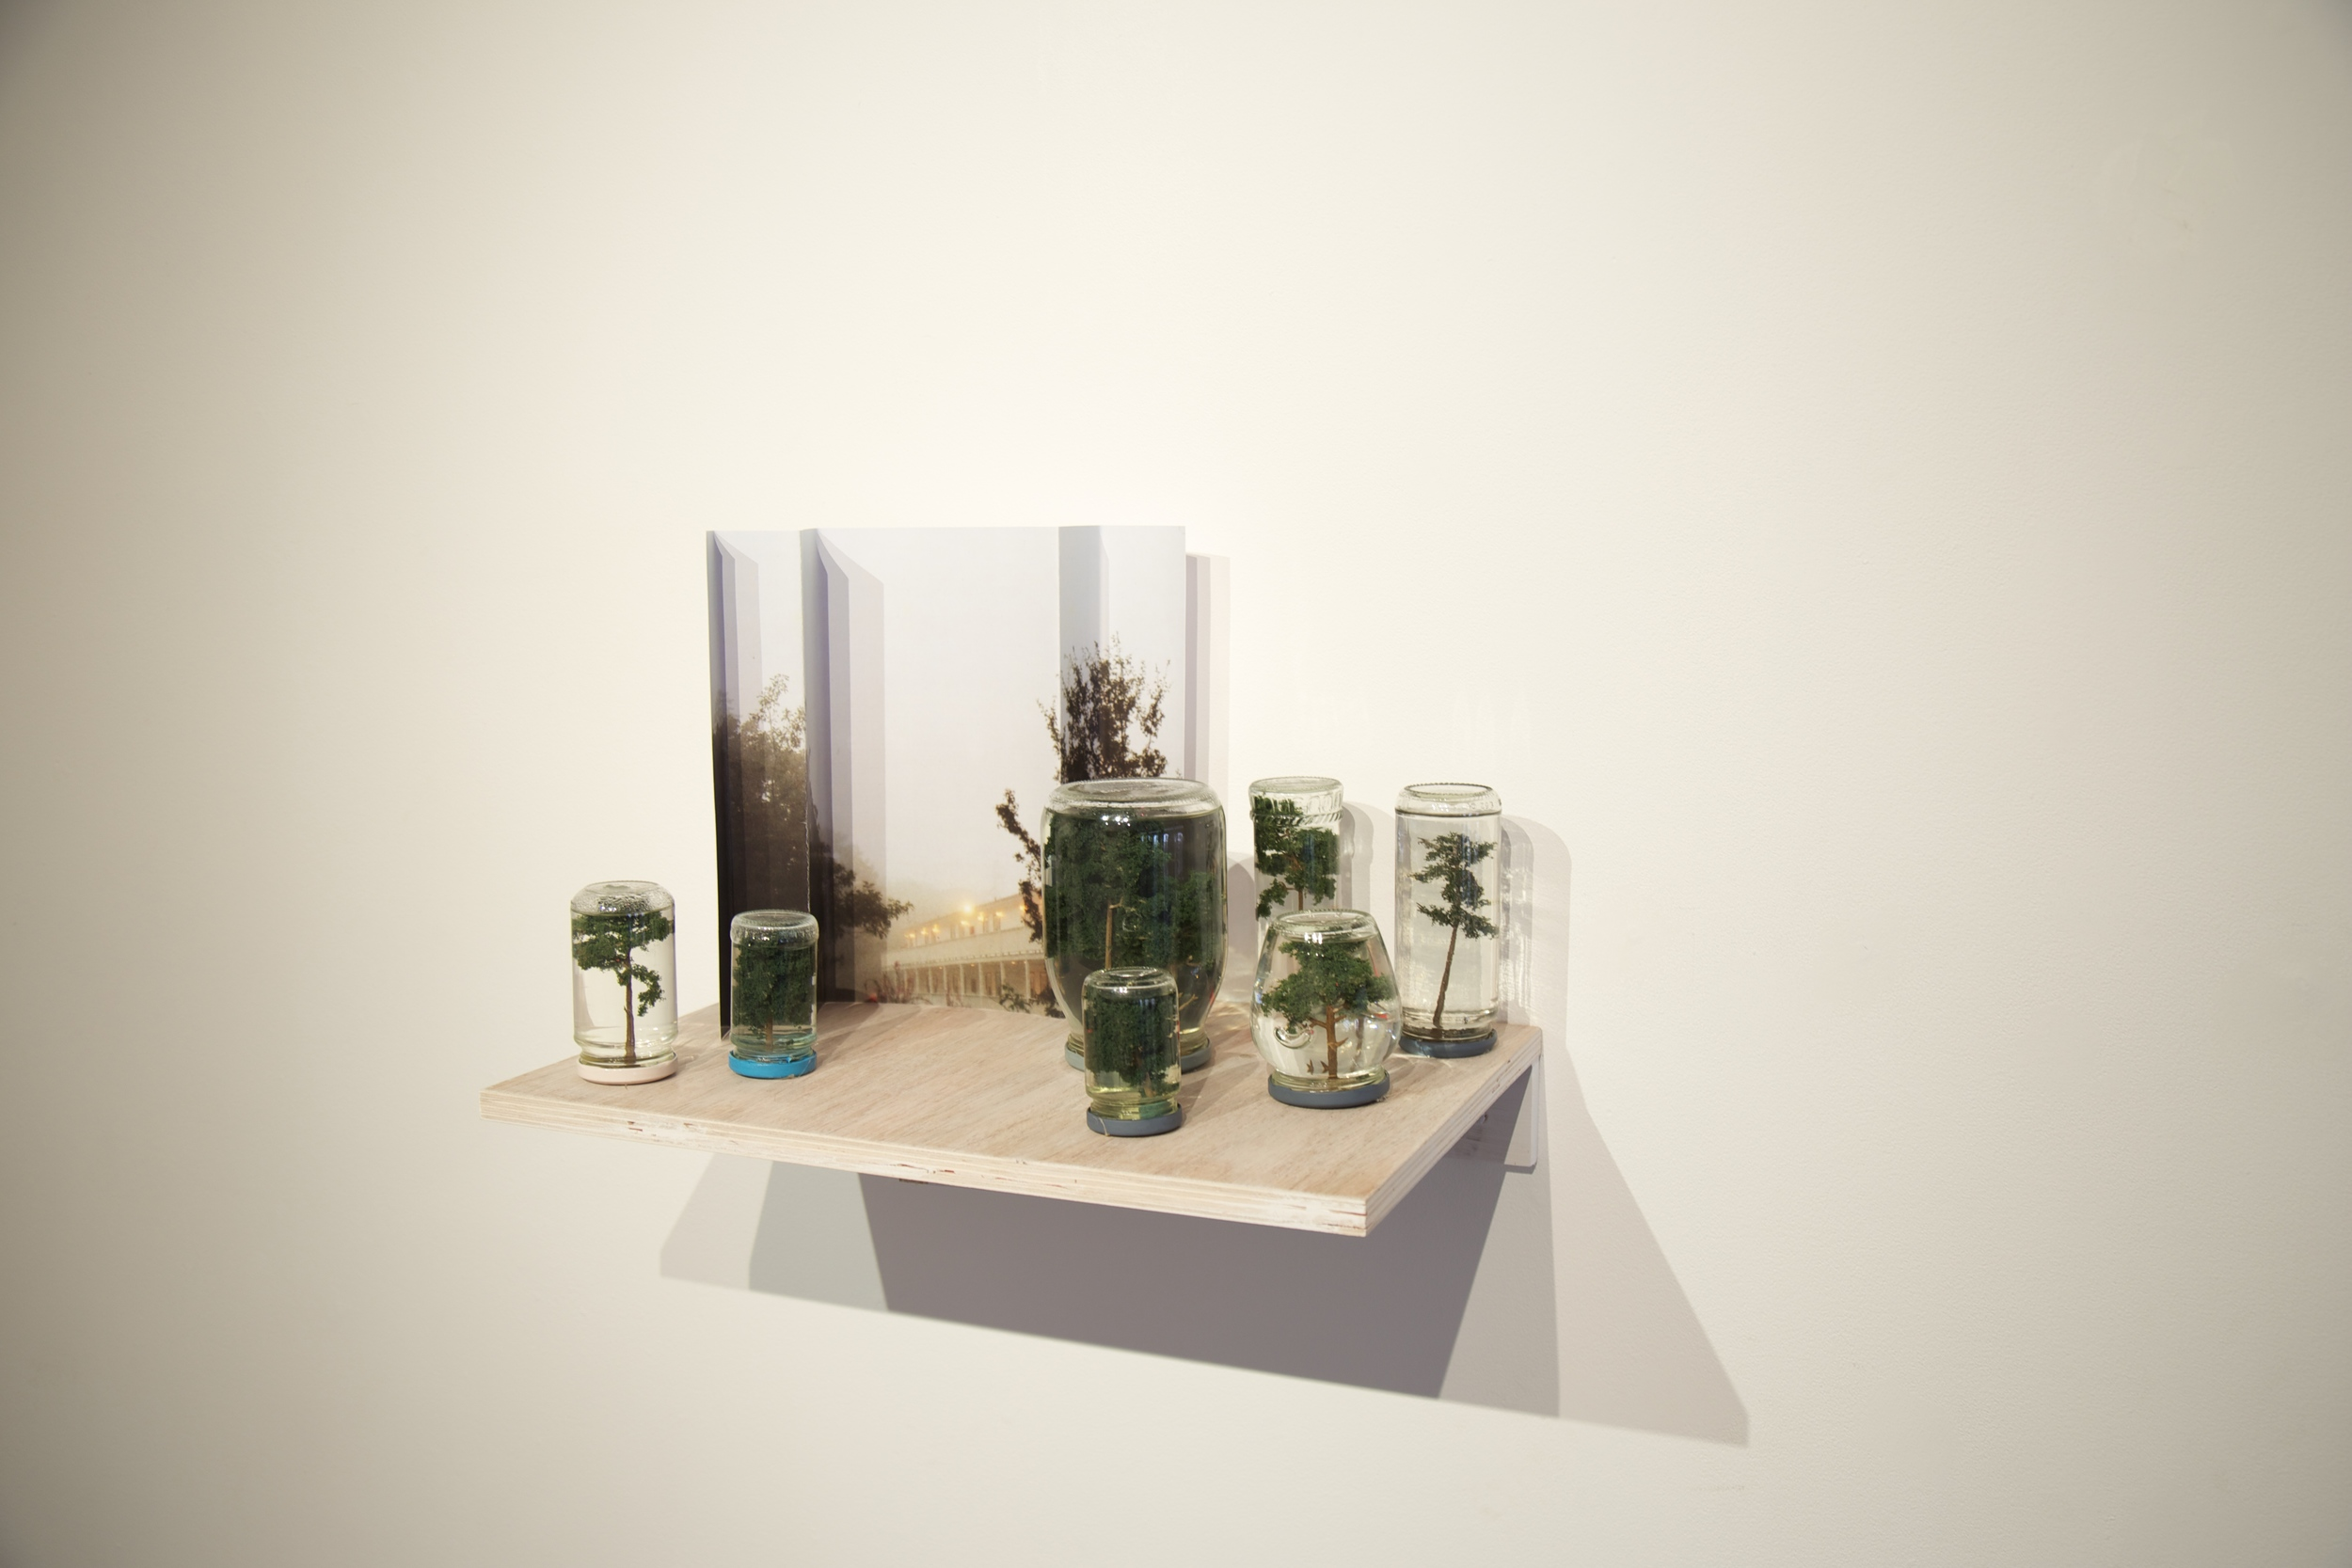 Sylvan setting series, 2015, Beth O'Halloran